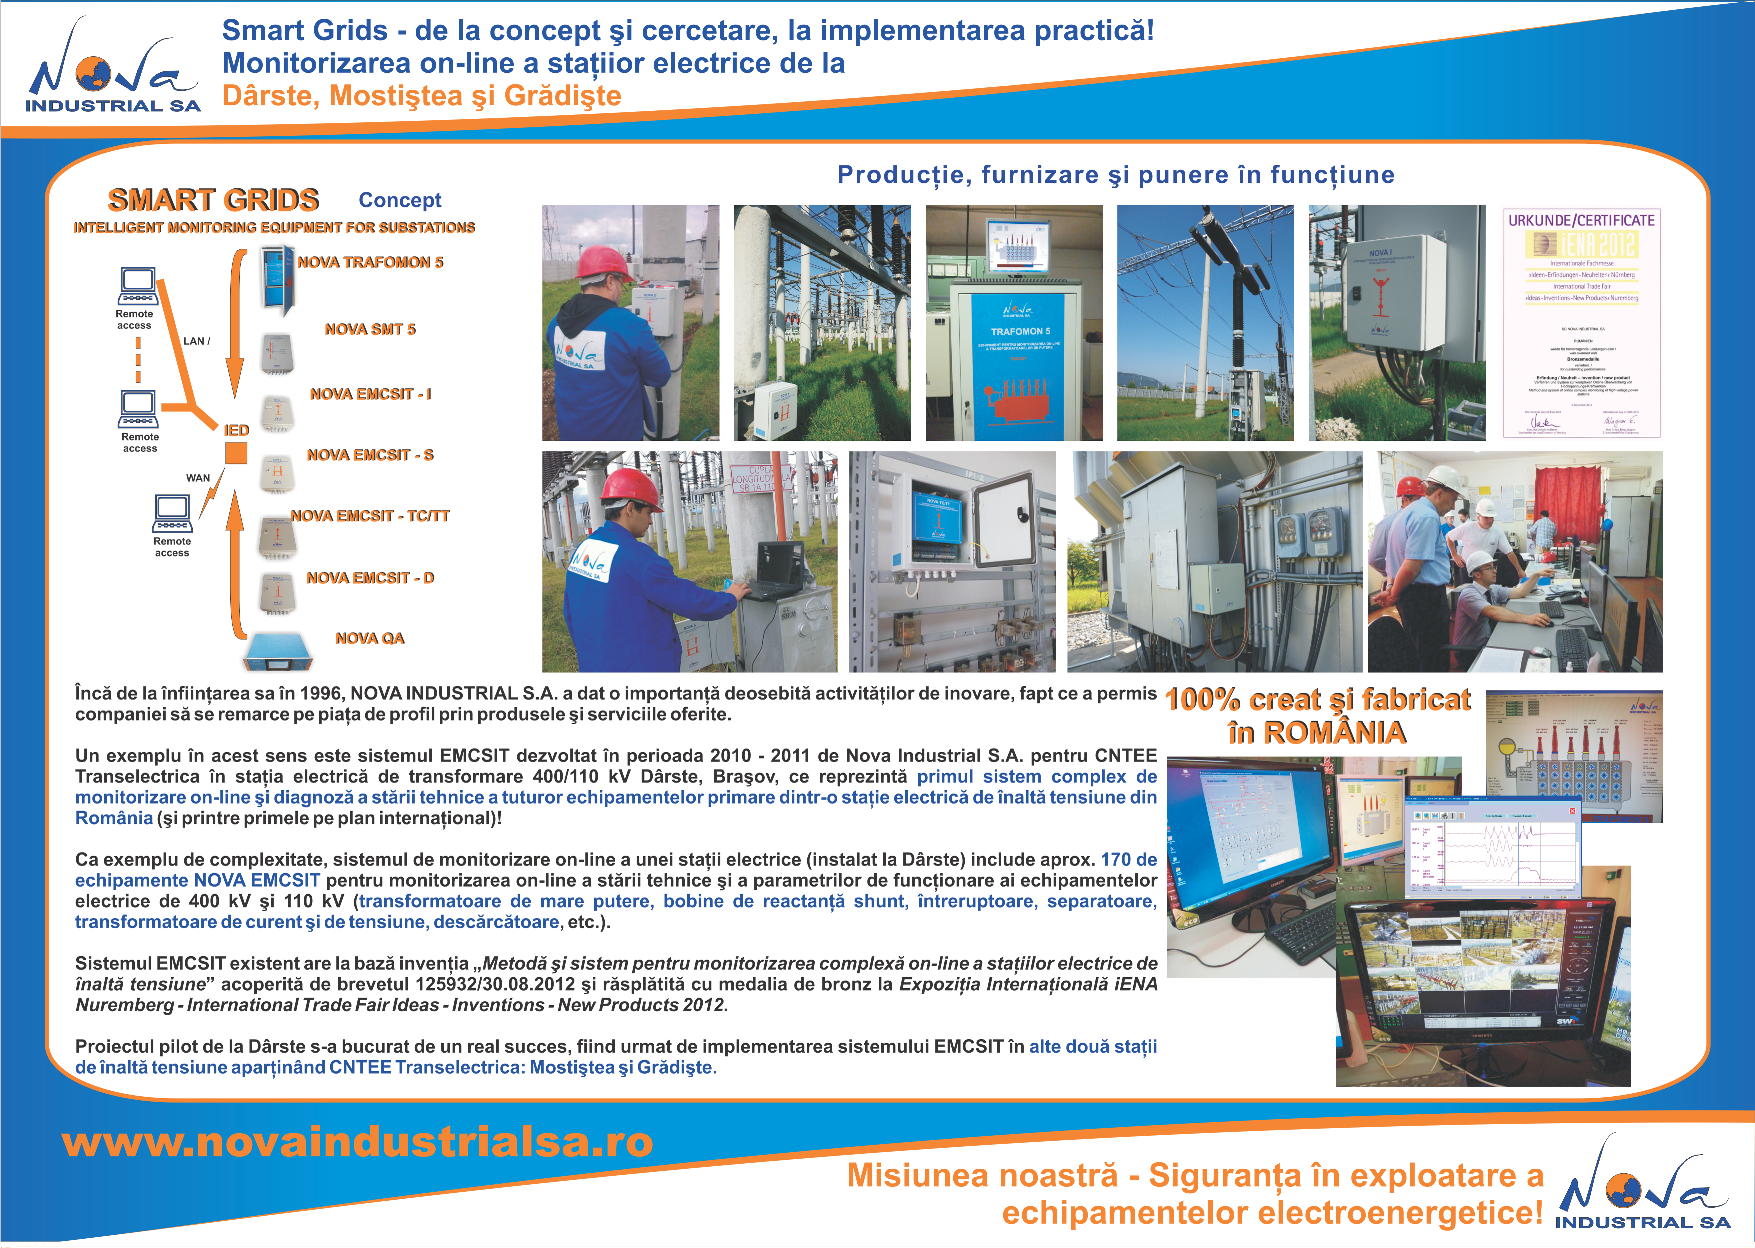 Monitorizarea on-line a trei statii electrice apartinand CNTEE Transelectrica!